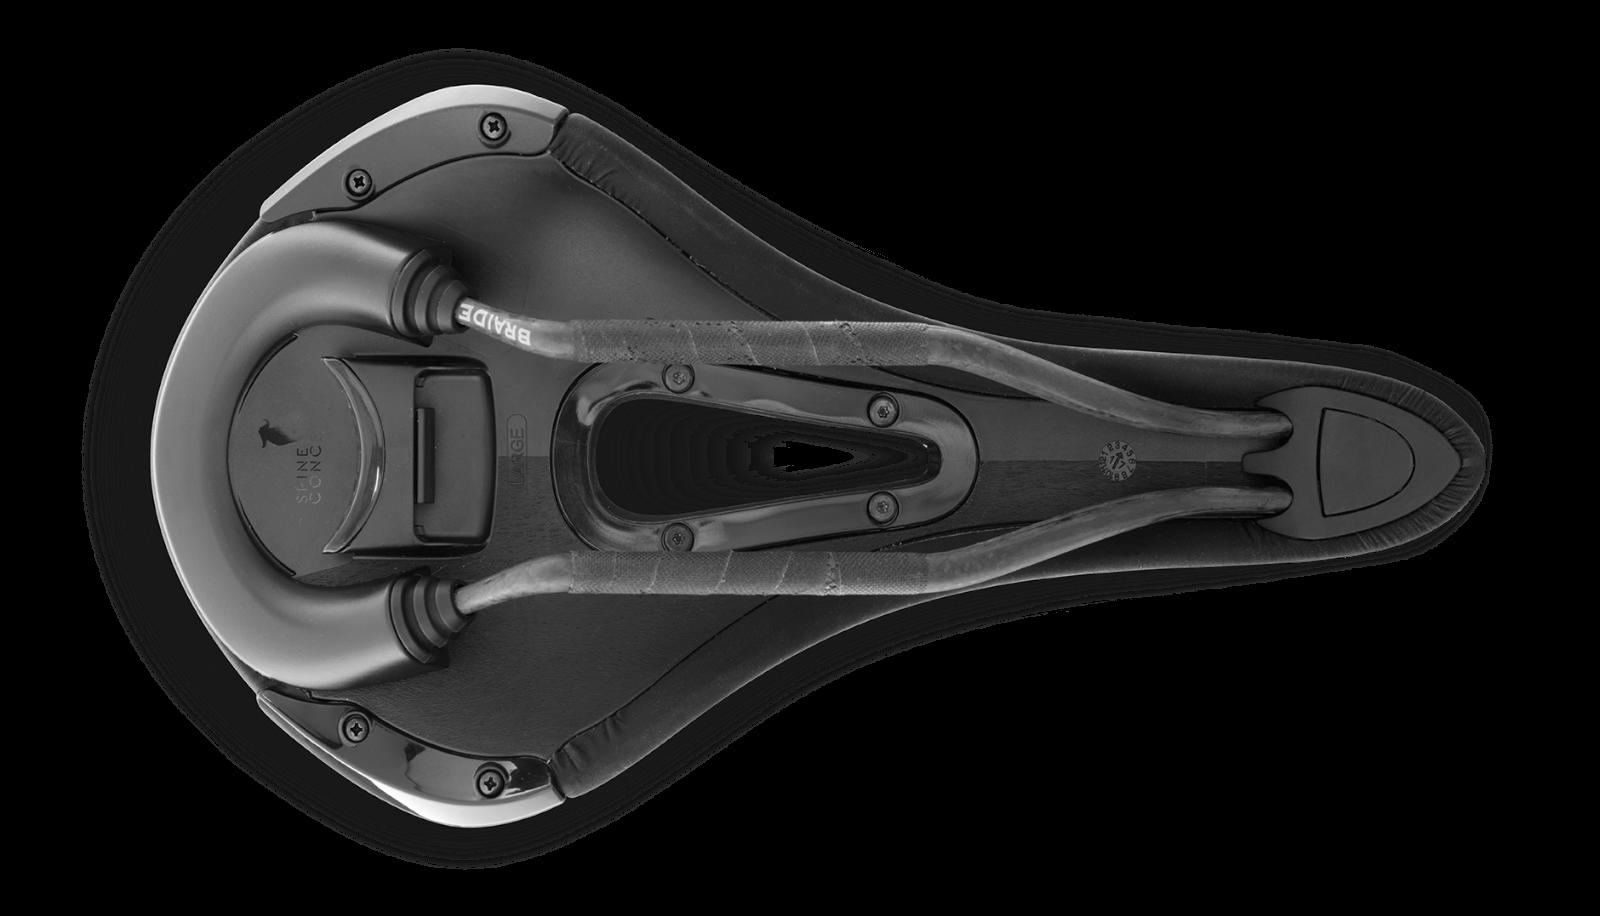 Sattel Fizik Segelflugzeug R1 OPEN groß 152mm Braided Kohlenstoff Kohlenstoff Kohlenstoff schwarz Matt     Elegant Und Würdevoll  ef9078